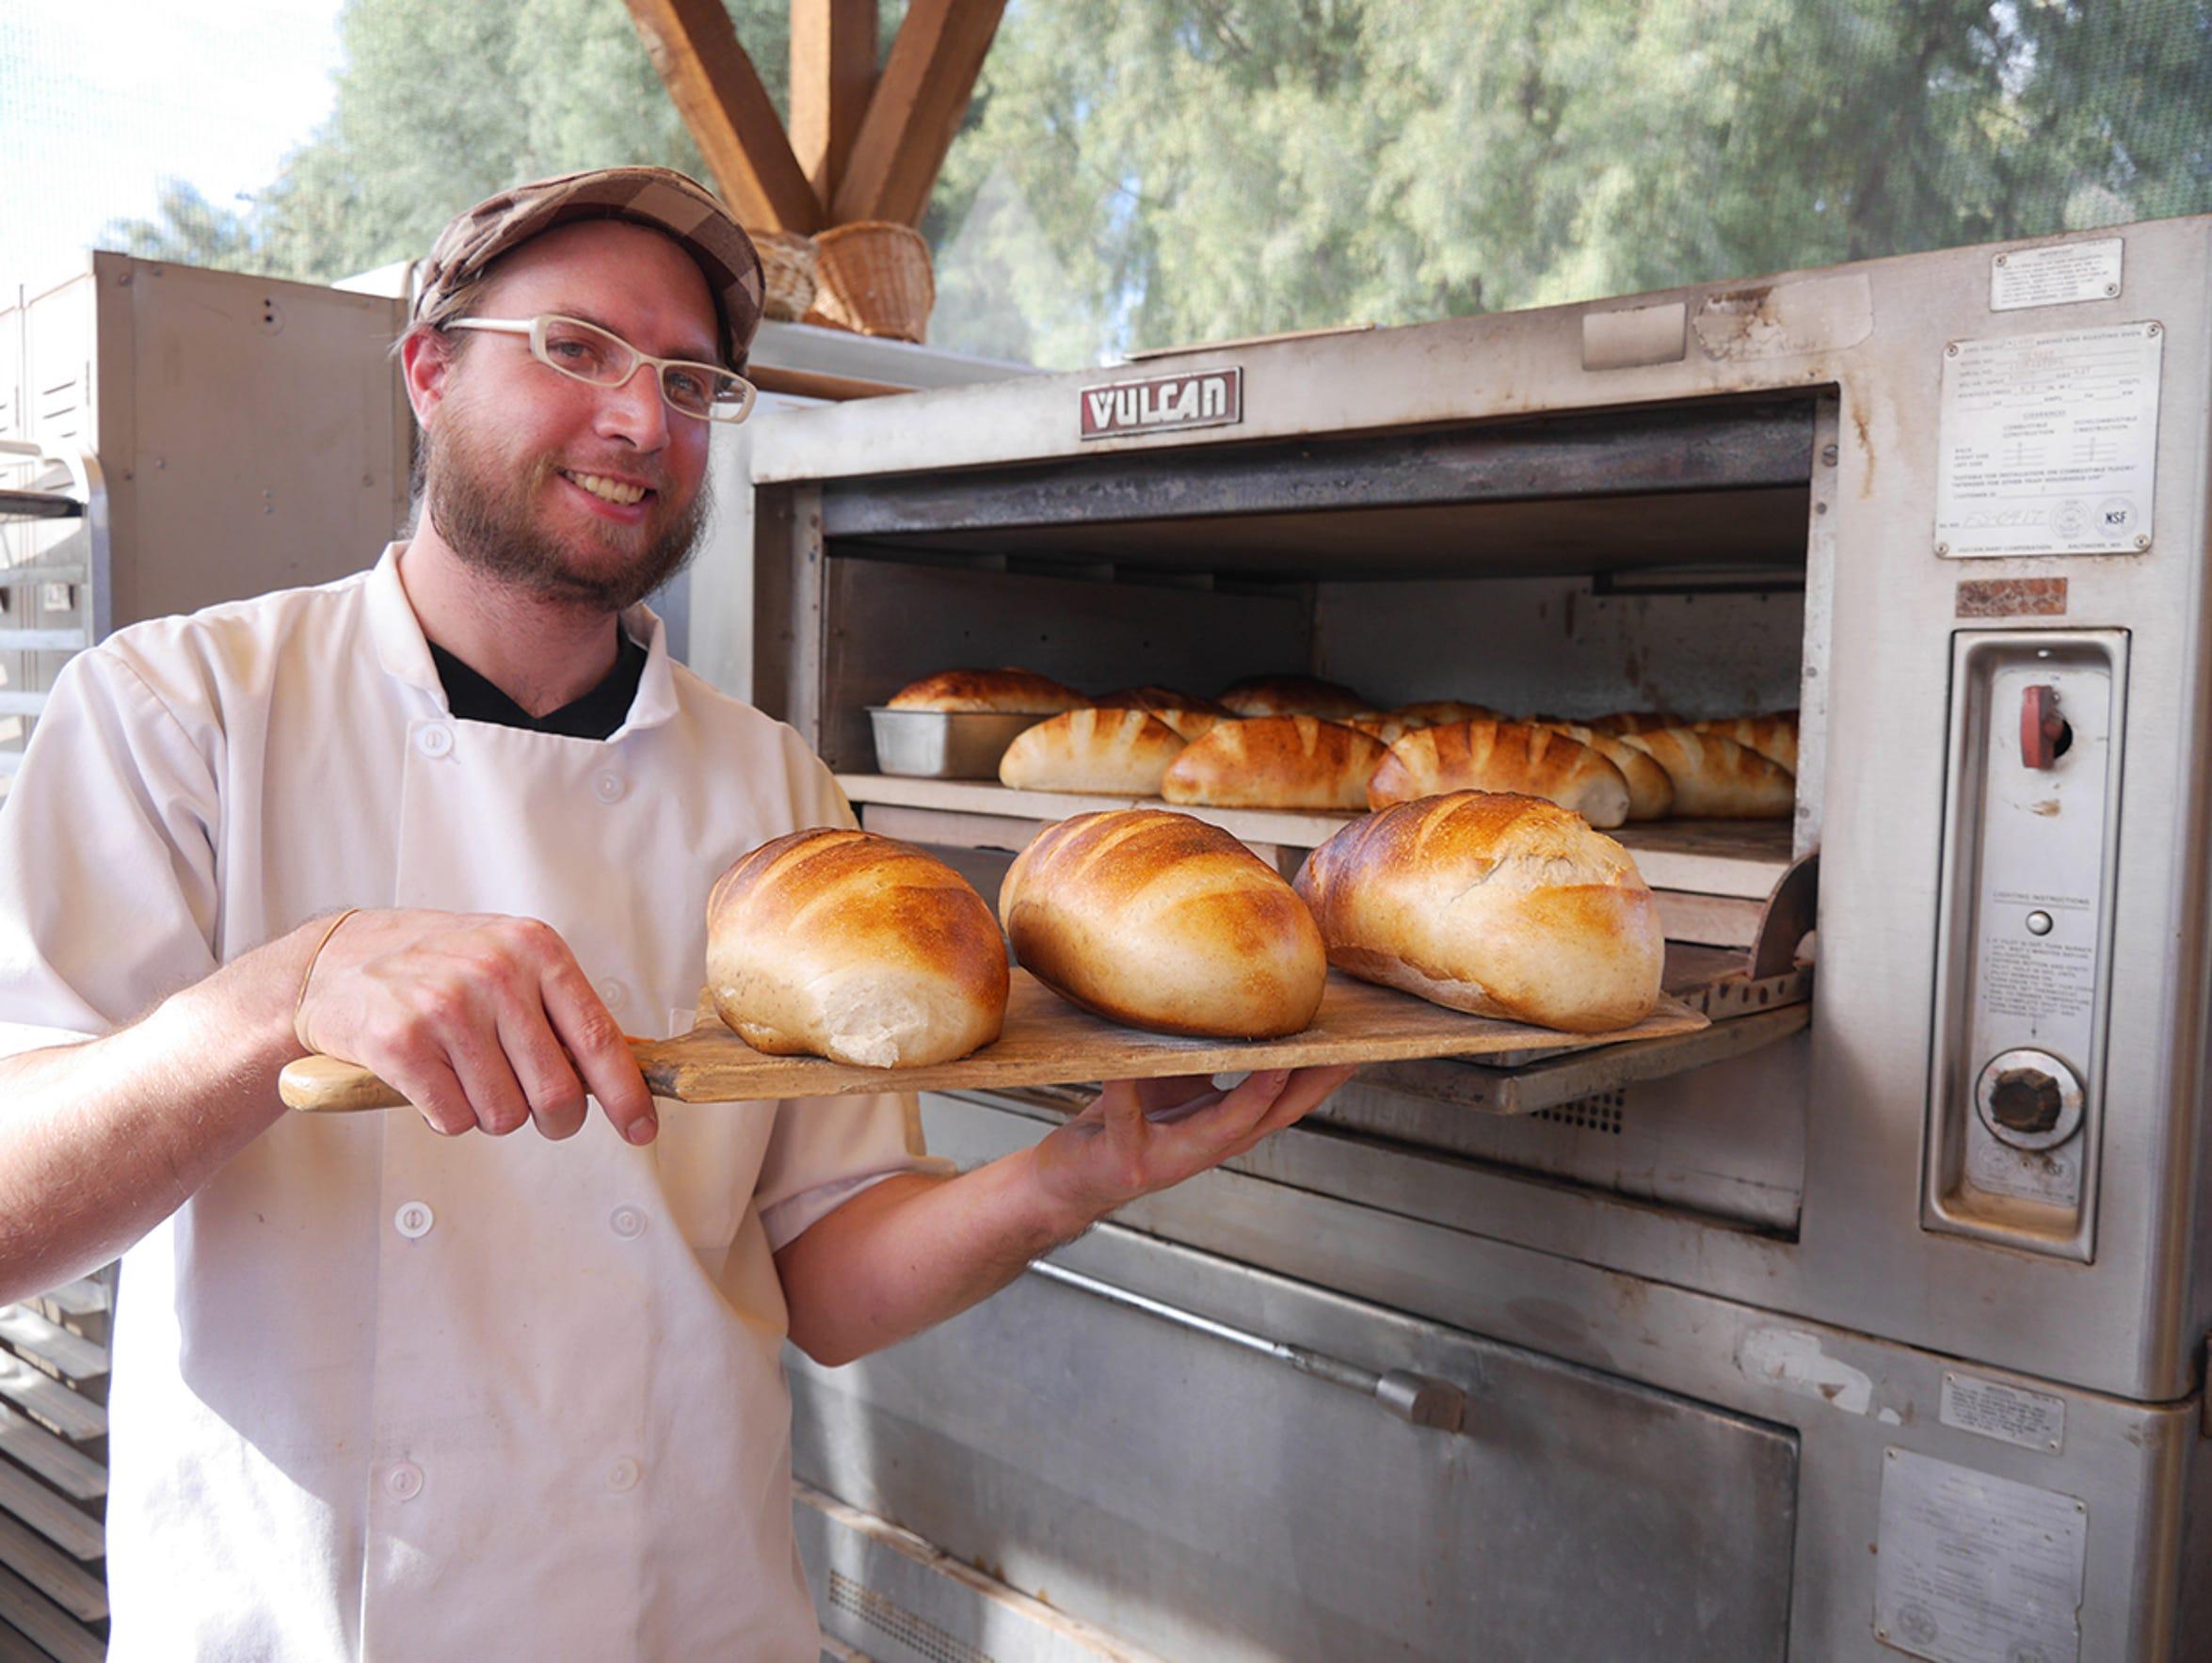 Sourdough bread baked daily.